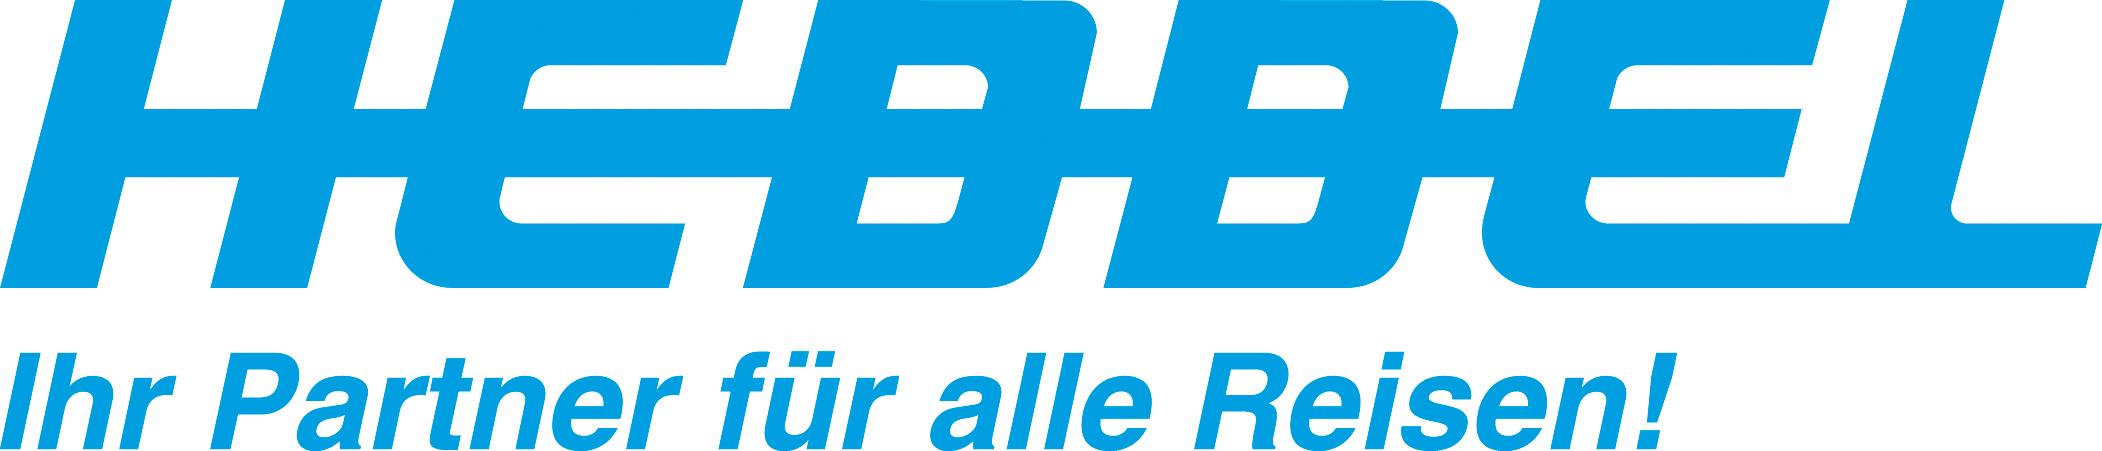 Reisebüro Hebbel Bergisch Gladbach